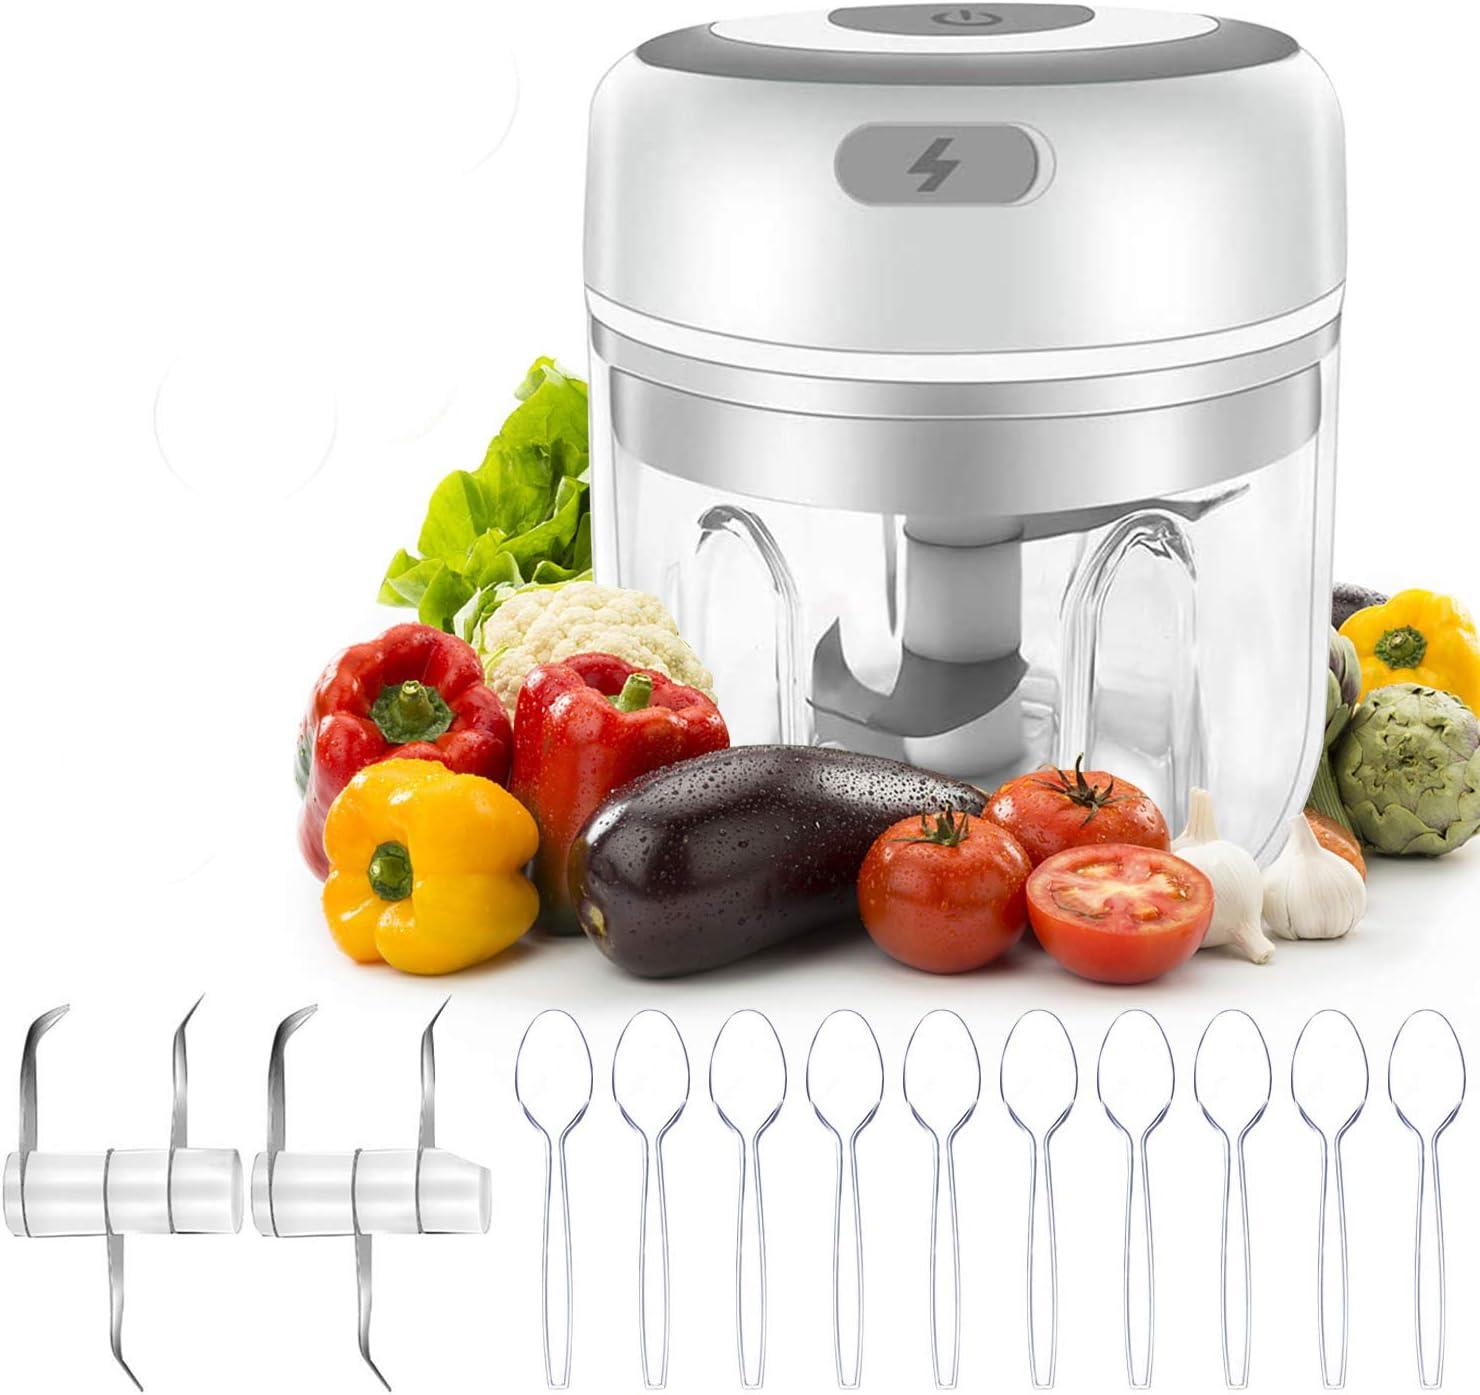 Electric Mini Garlic Chopper, Mini Food Chopper, Portable Waterproof Mini Food Processor, Garlic Grinder Chopper Mini Blender with USB Charging For Pepper Meat Chili Vegetable Nuts (250ML)